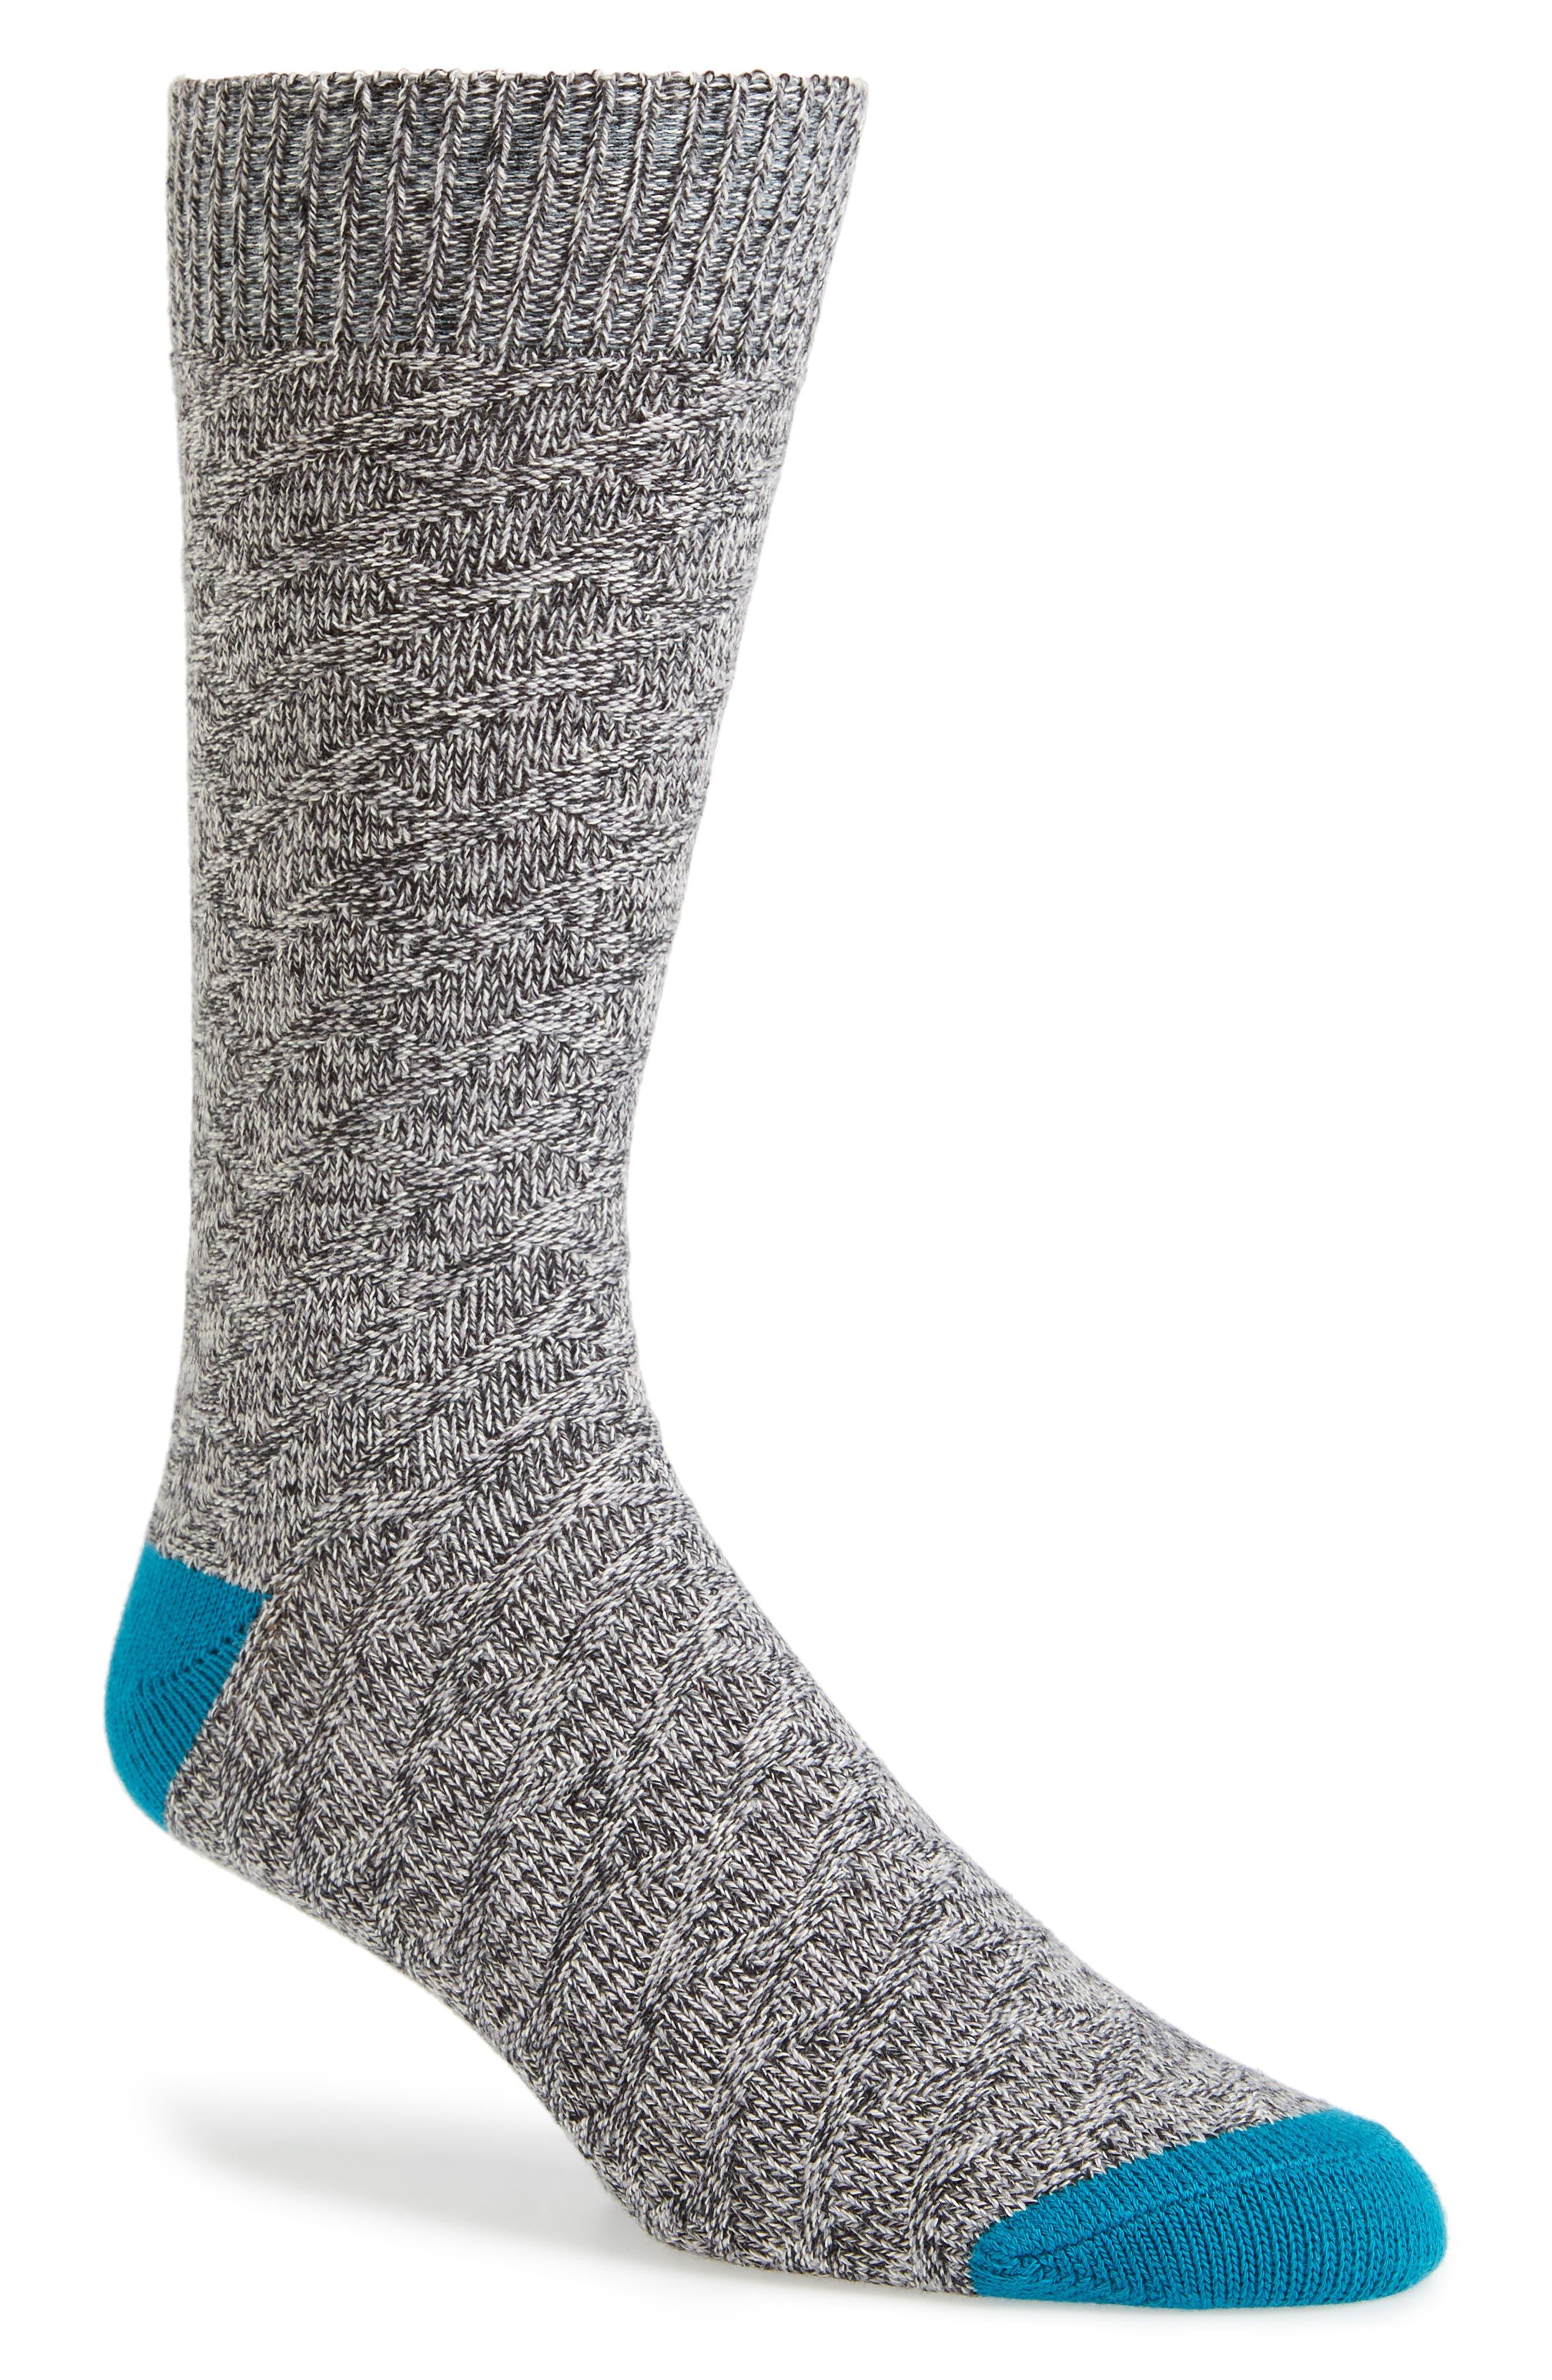 Icart Solid Socks,                             Main thumbnail 1, color,                             021